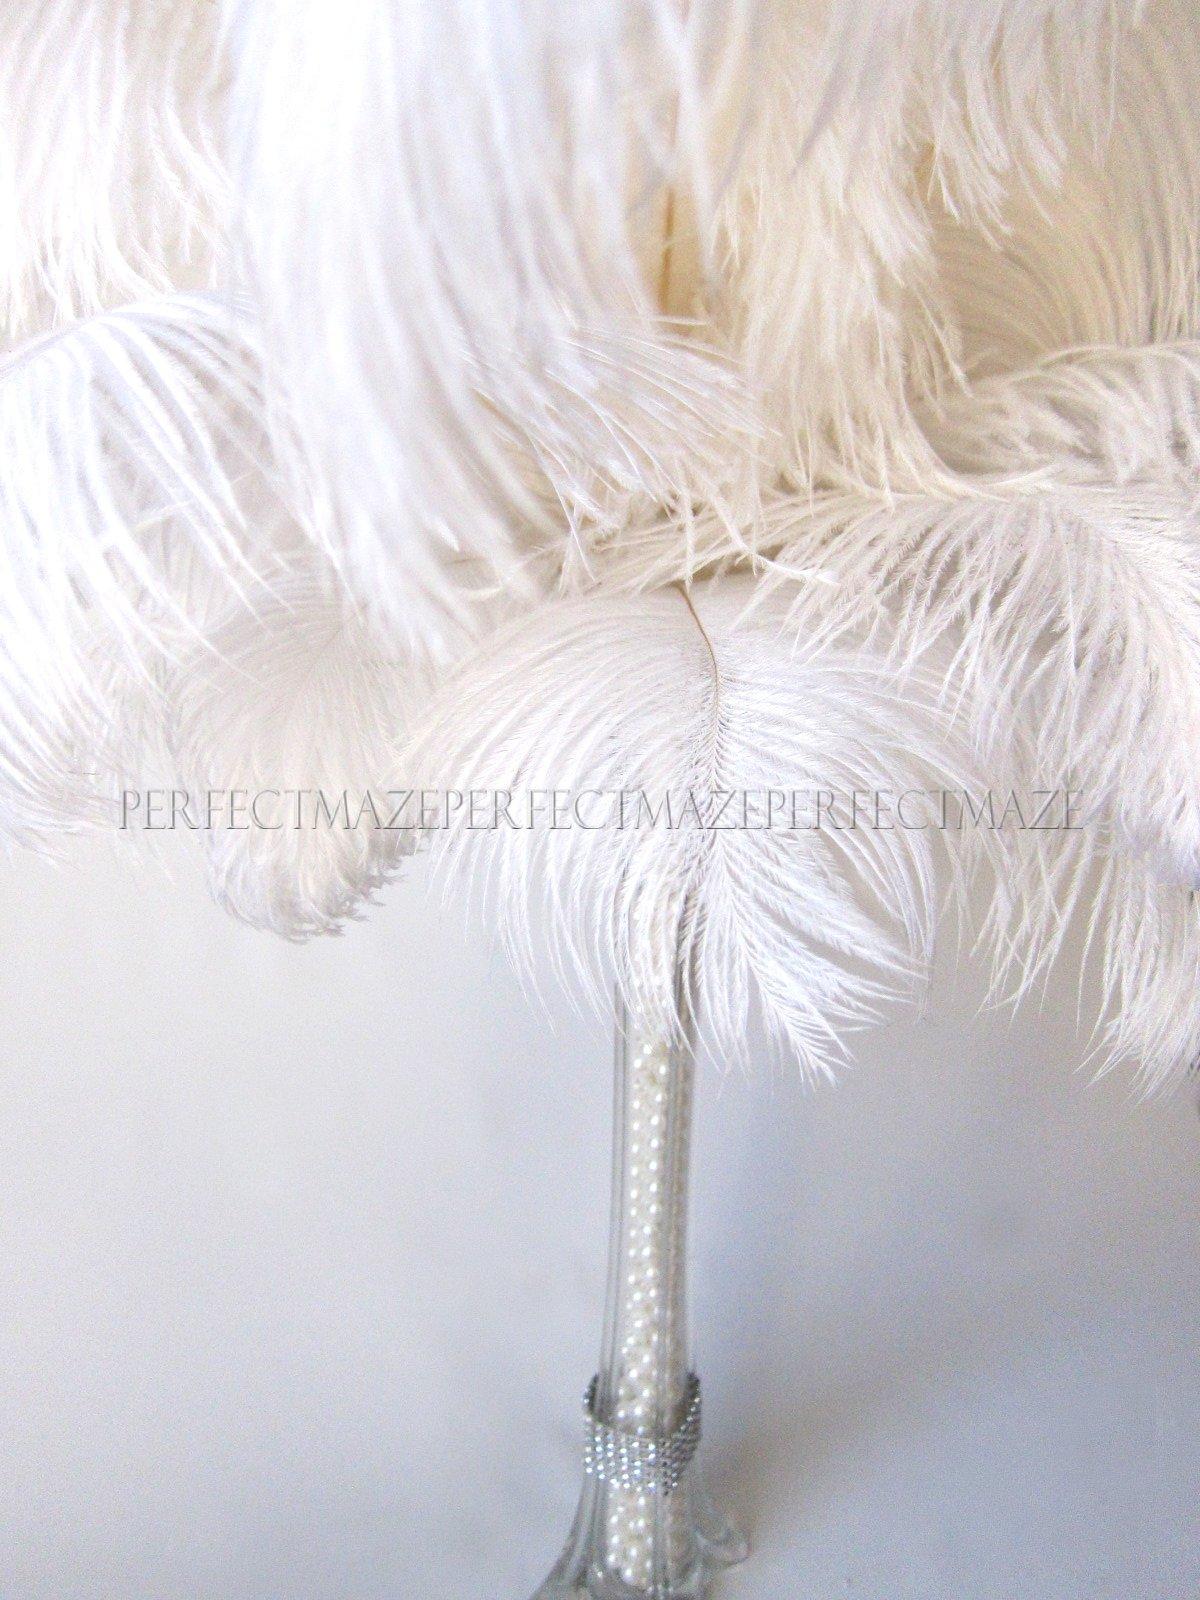 Perfectmaze 100 Piece 16''-18'' Ostrich Feather Premium Quality for Wedding Party Centerpiece Vase Decoration